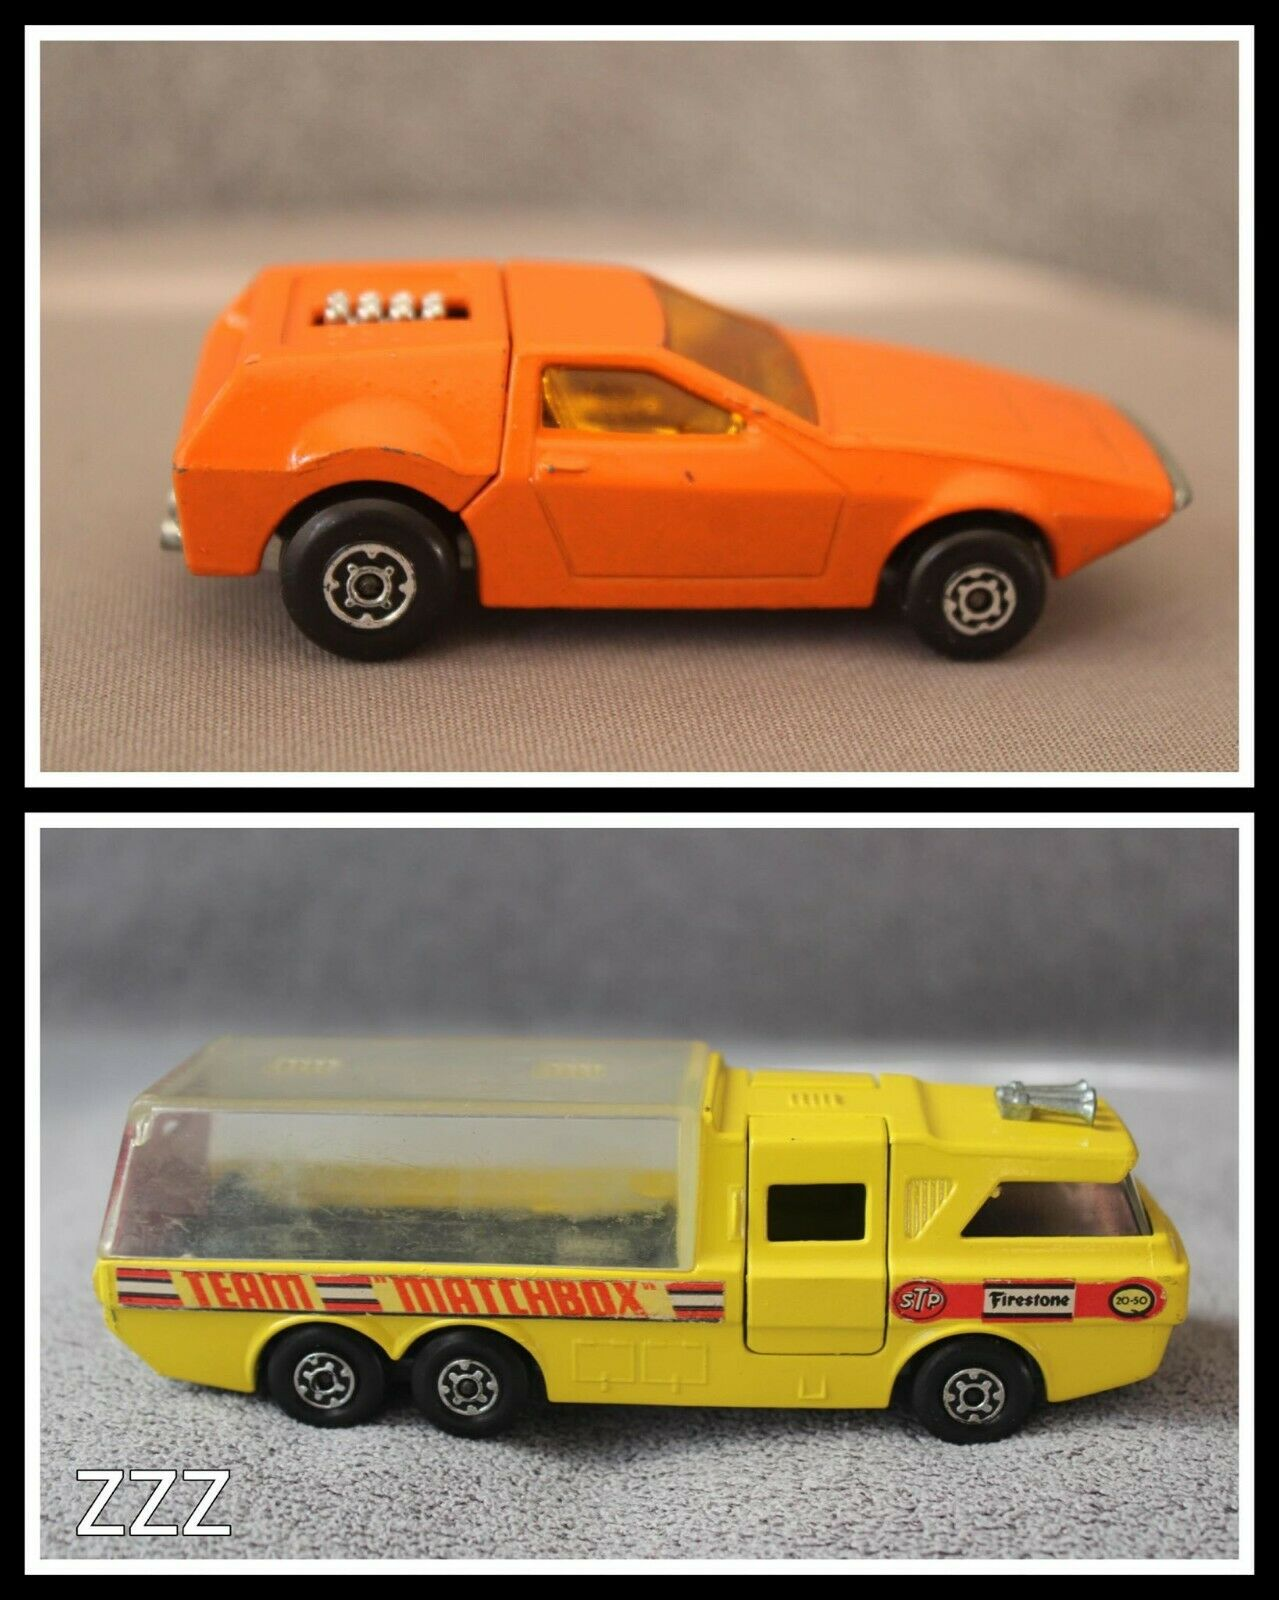 1972 Matchbox Team Super Kings K-7 Racing Car Transporter + Tanzara No 53